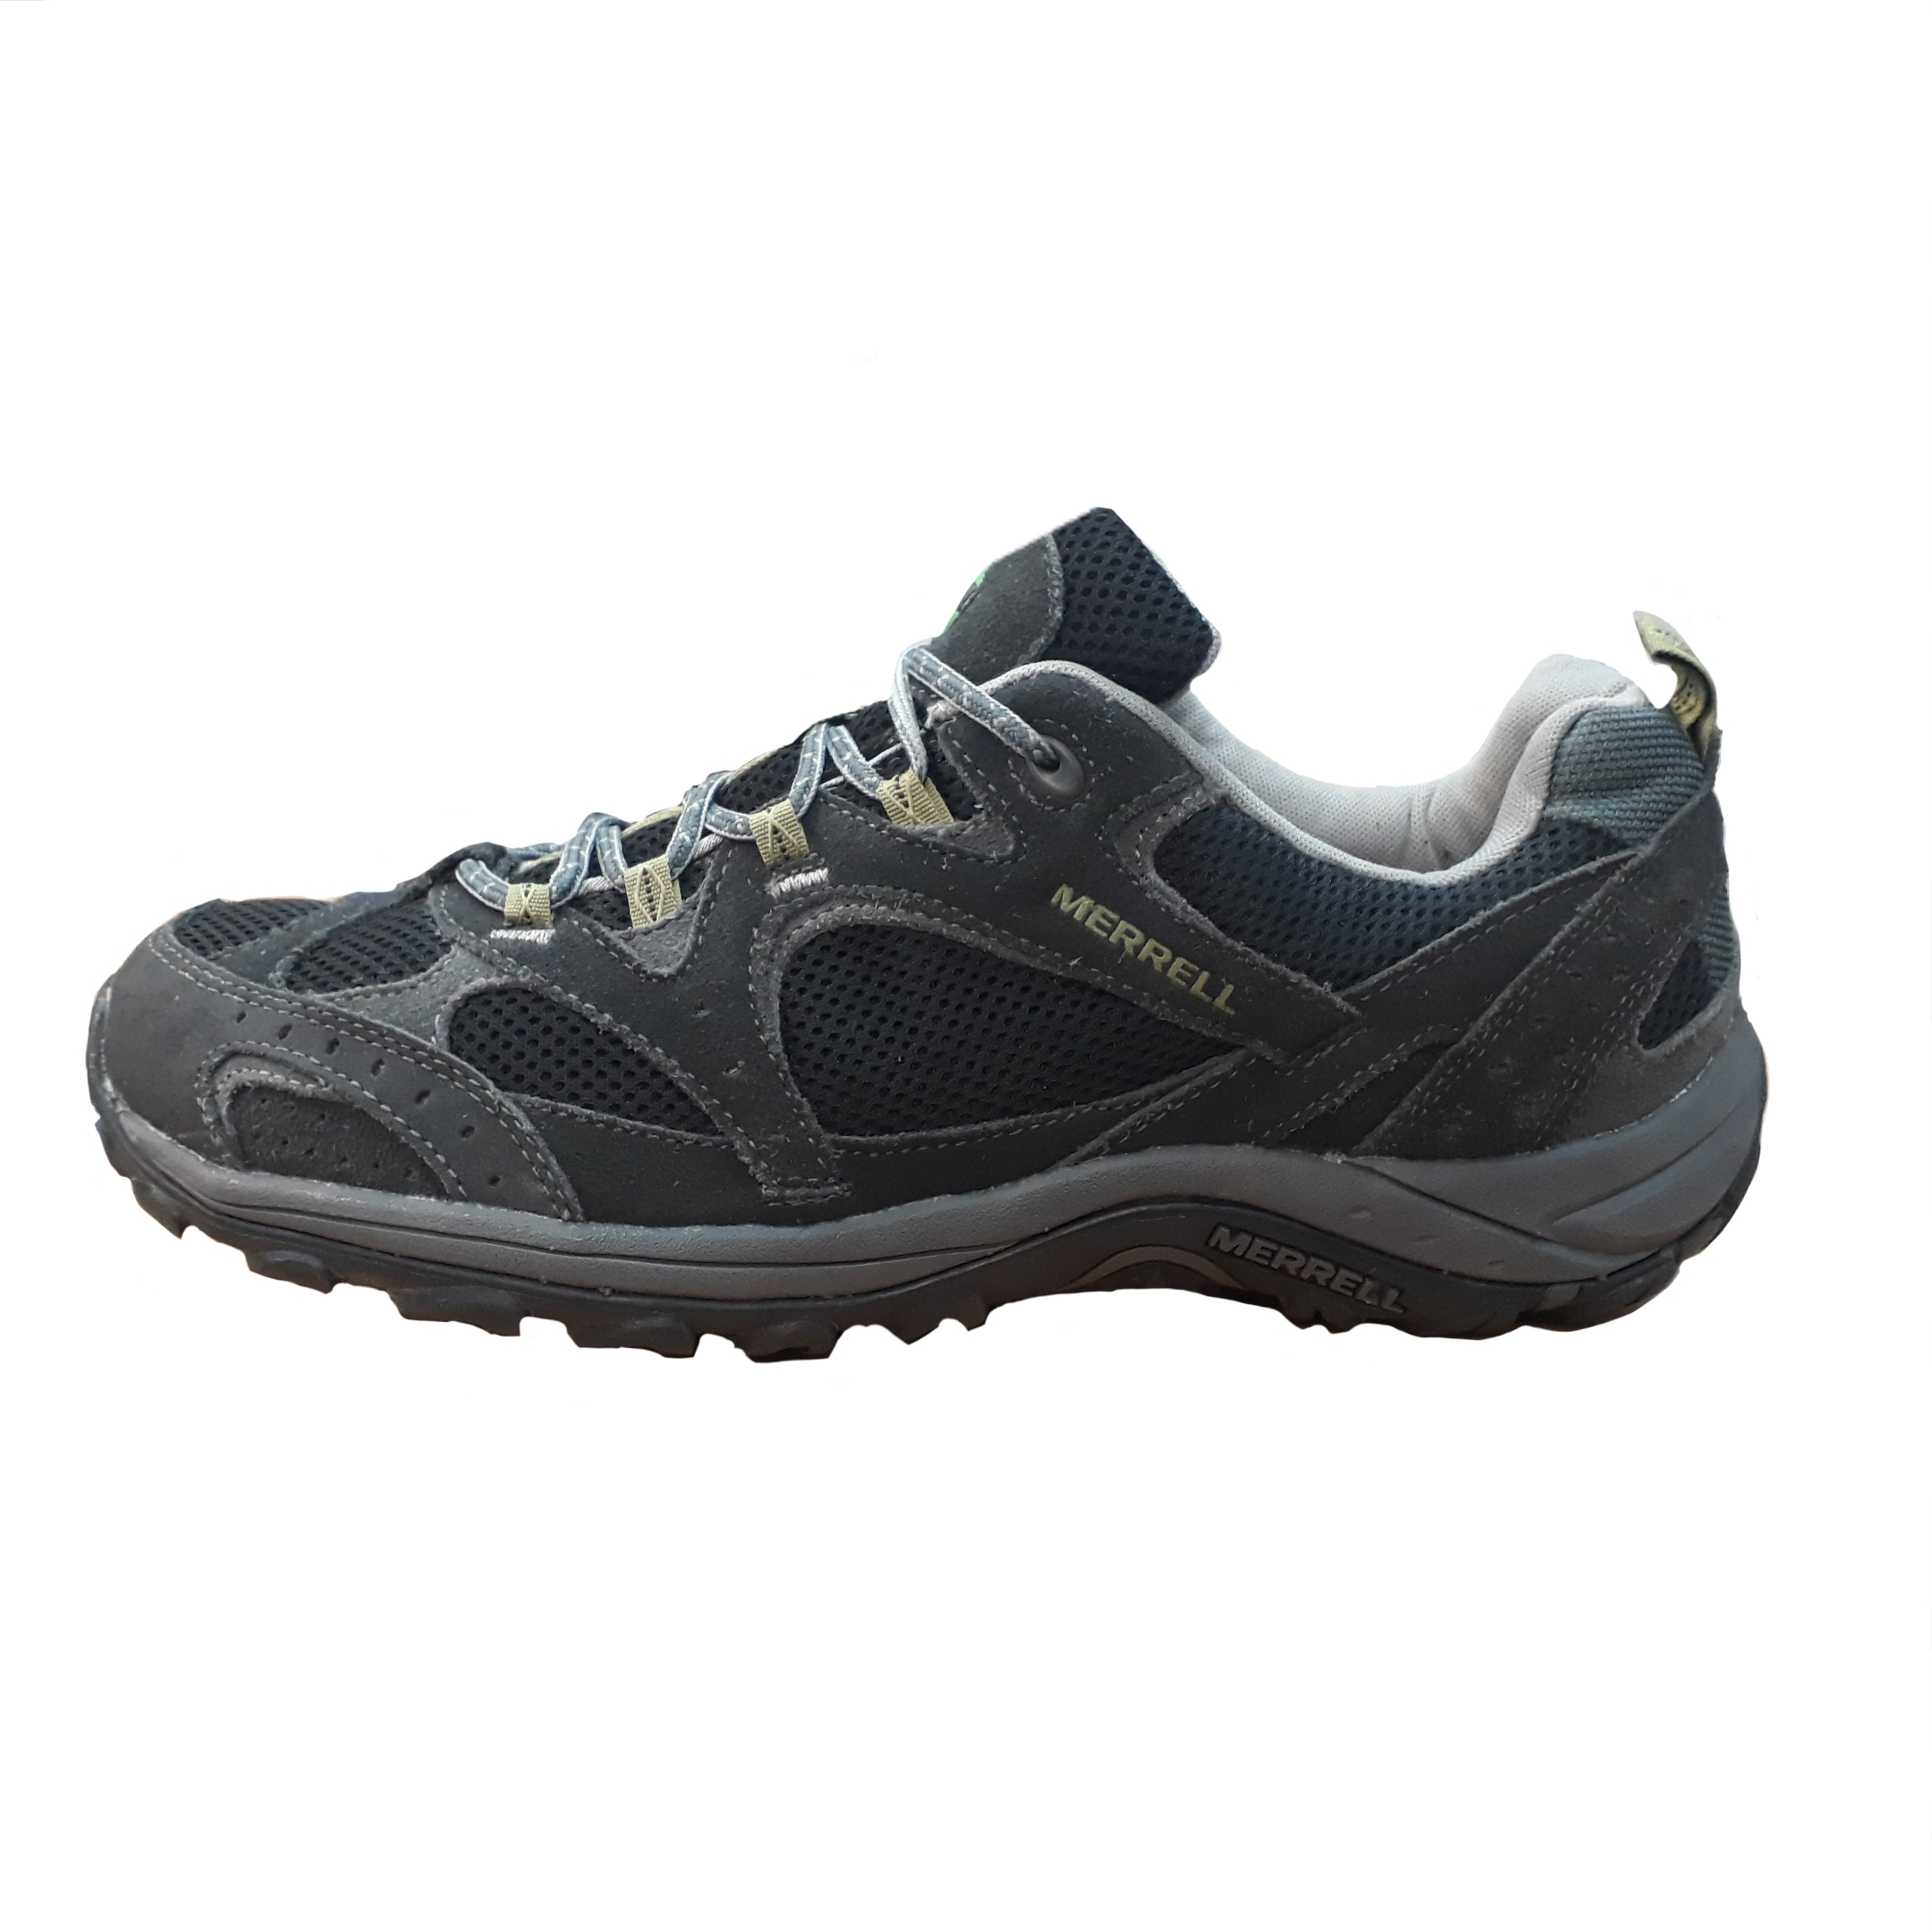 قیمت کفش کوهنوردی مردانه مرل مدل waltop 1